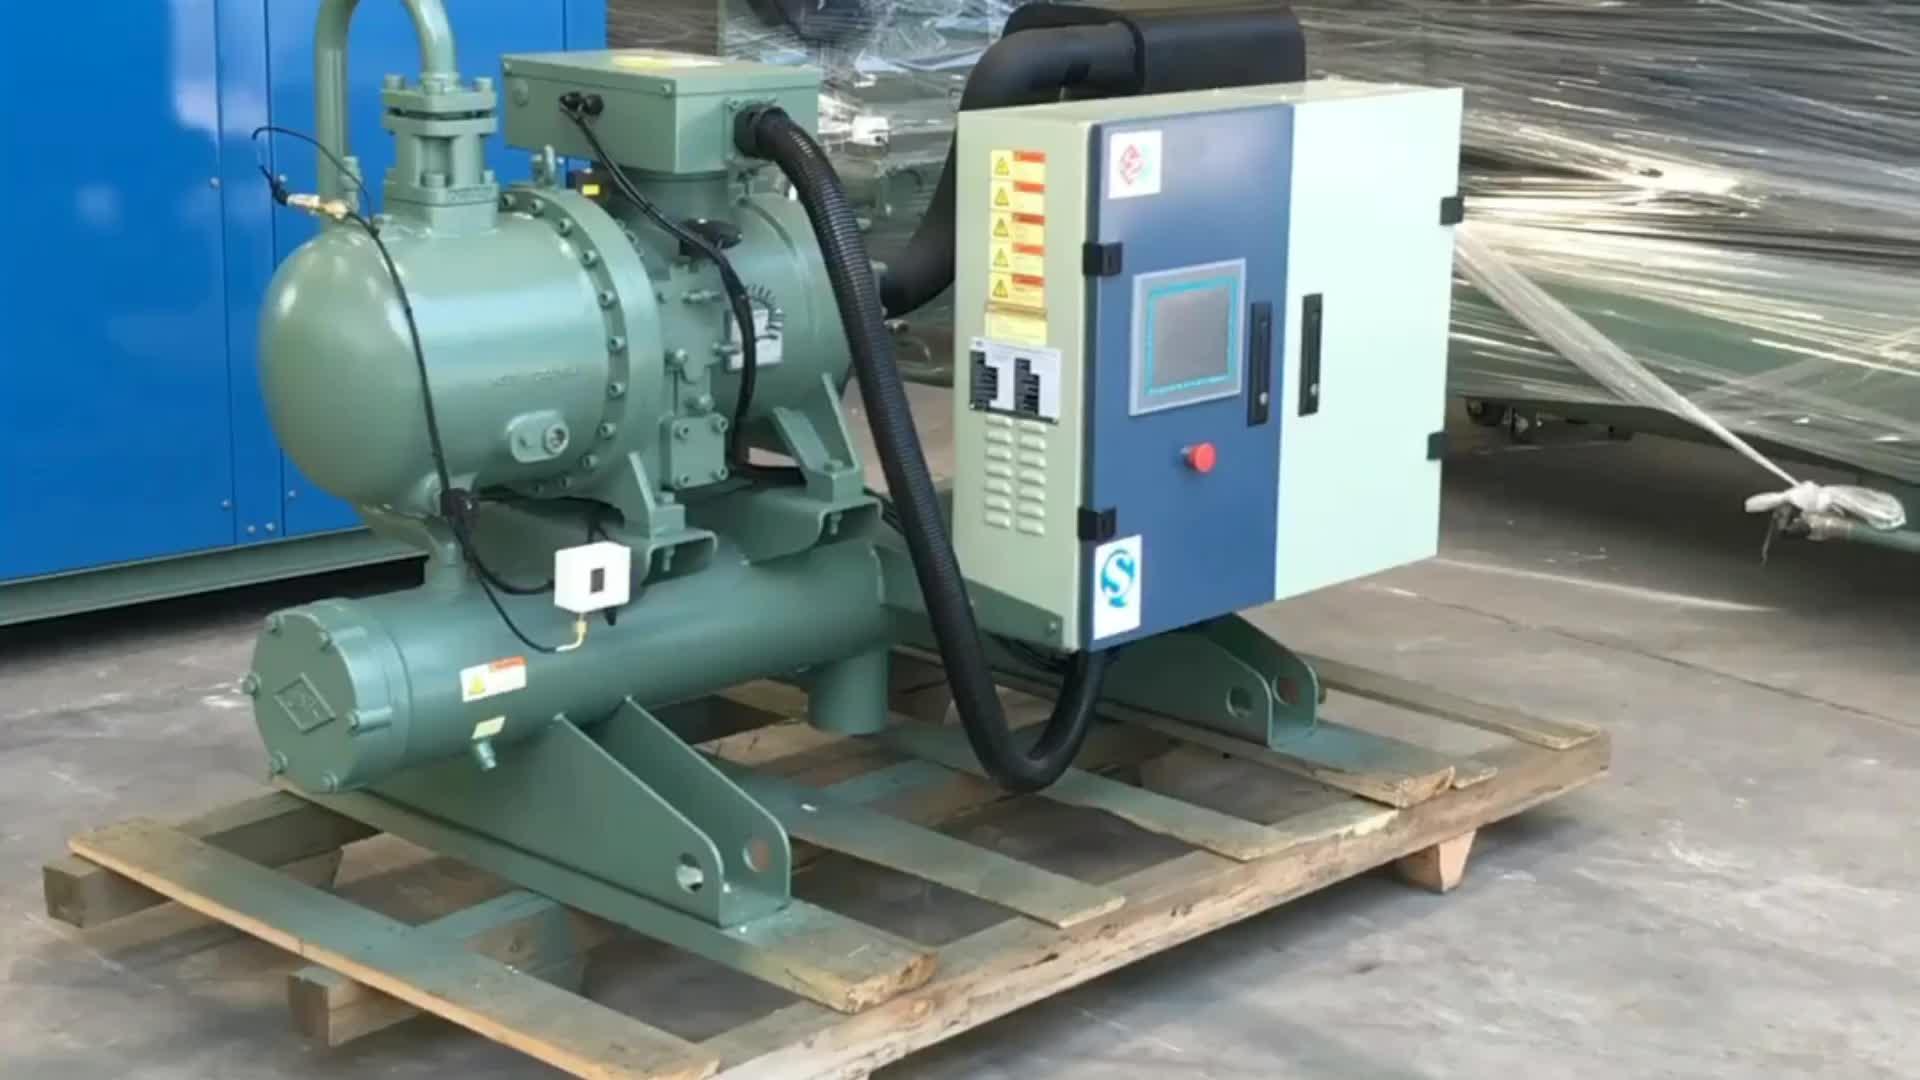 Industriële Chiller Scroll Open Type 5 Ton Water Chiller Prijs, Scroll Compressor 3 Ton Water Chiller, 5 Hp Water Chiller